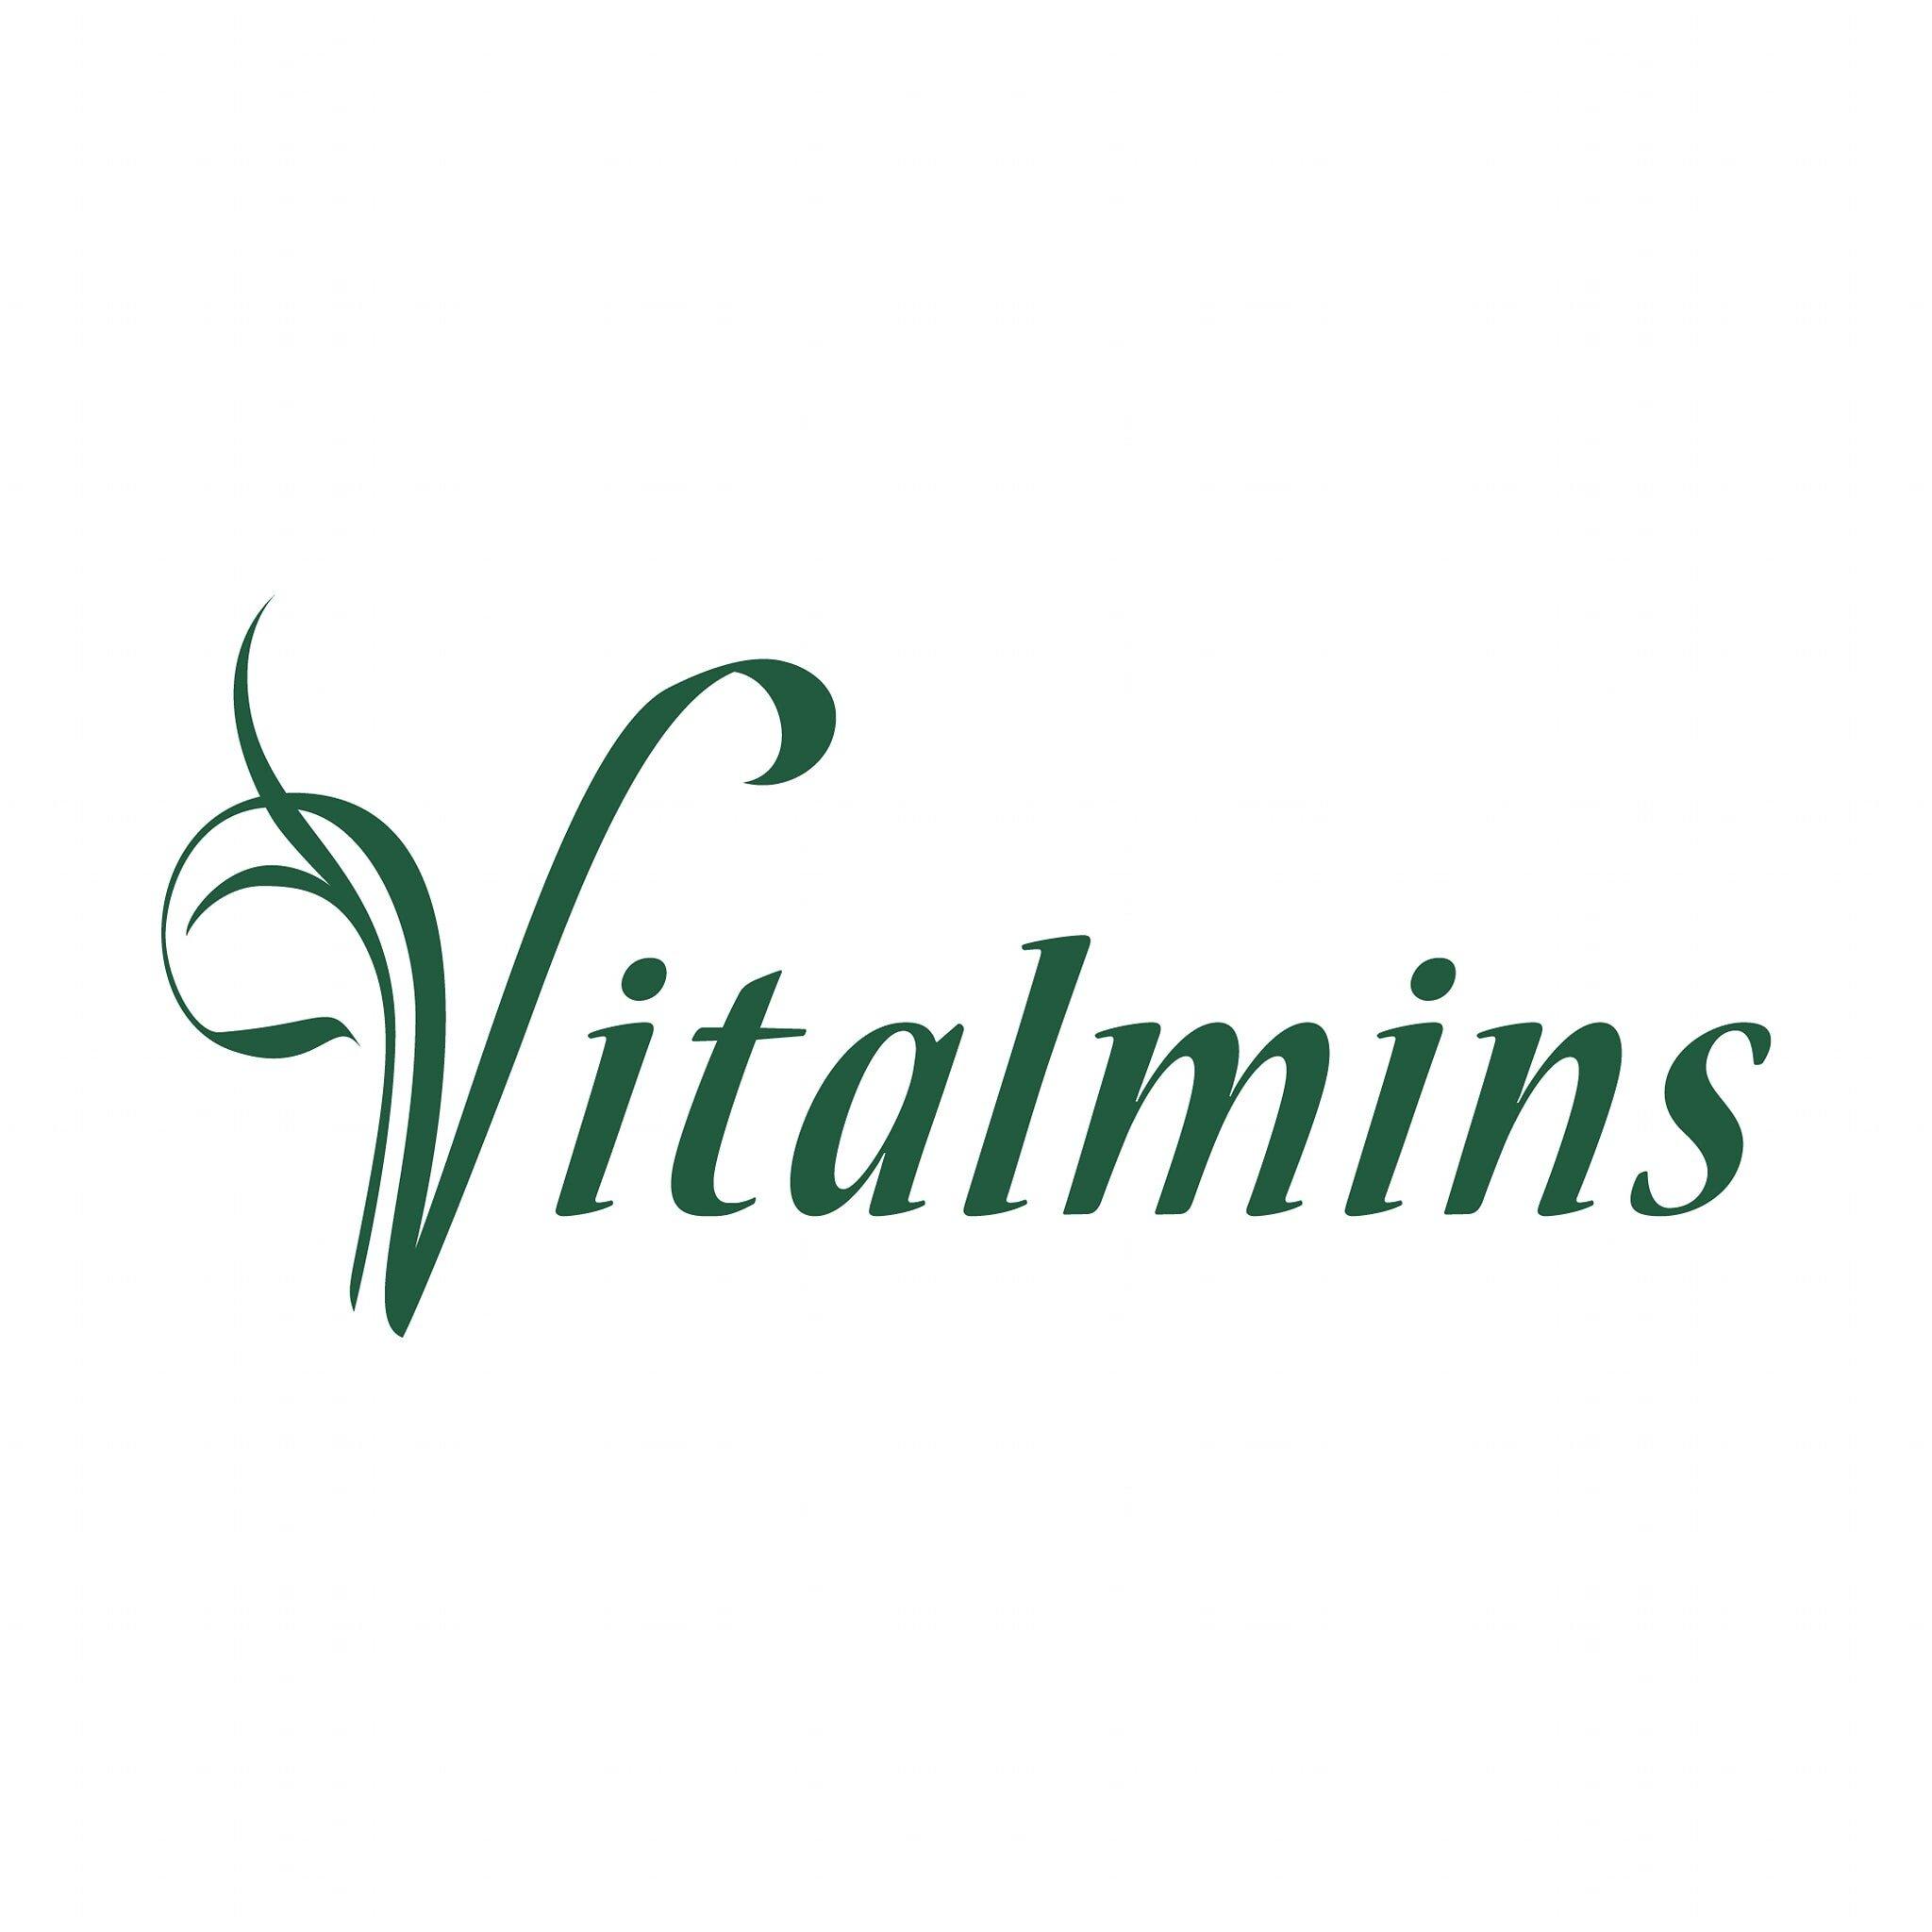 Vitalmins Logo